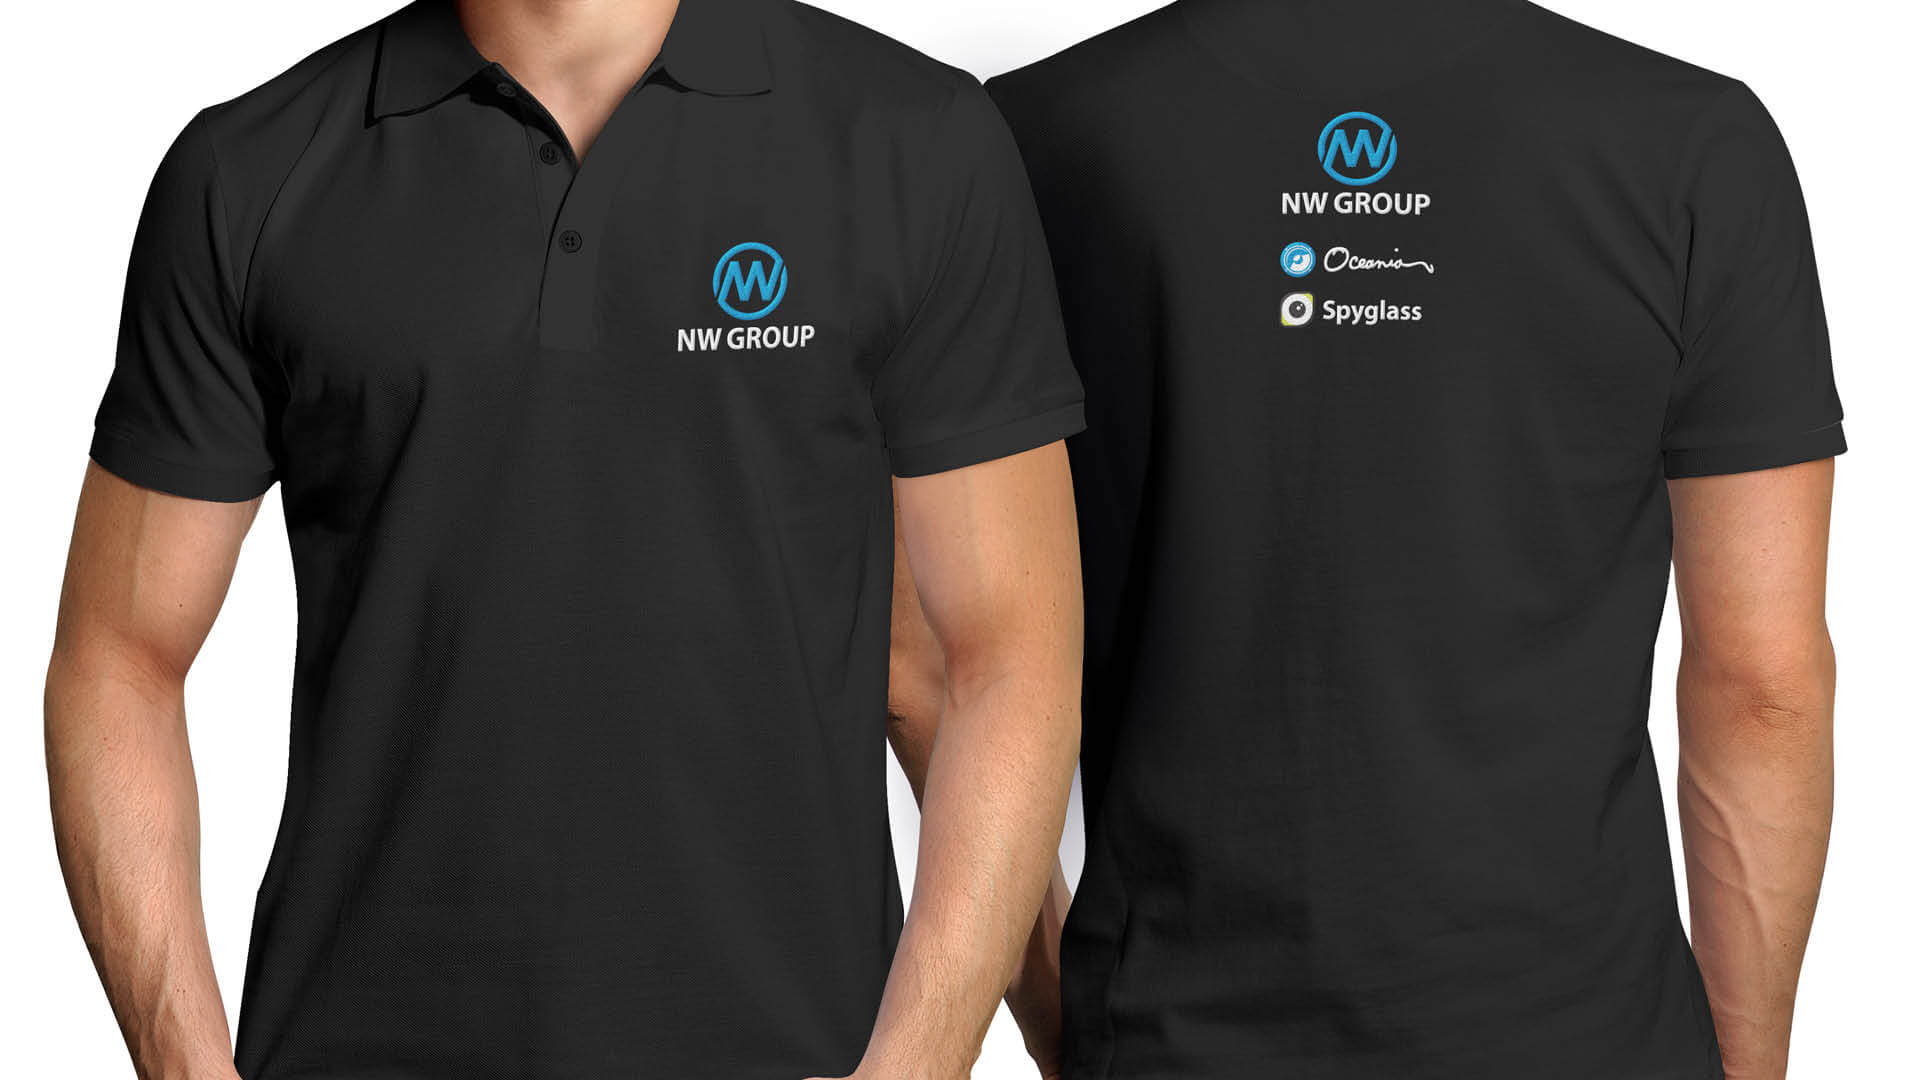 NW GROUP - Zadro Agency